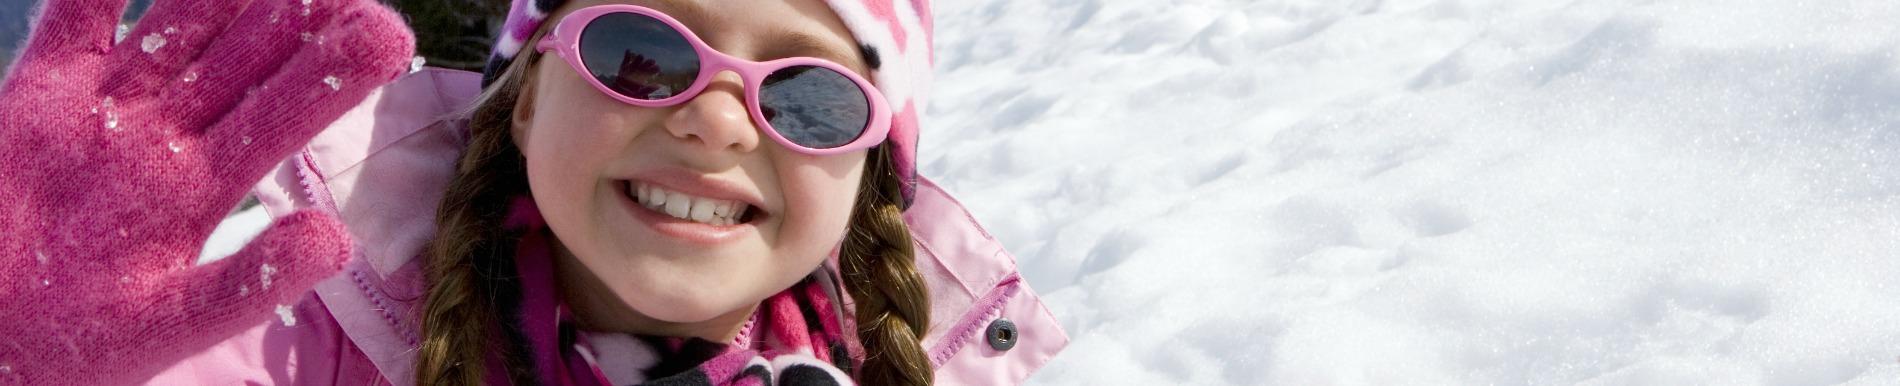 https://www.healthychildren.org/SiteCollectionImage-Homepage-Banners/SunglassesWinter_Banner.jpg